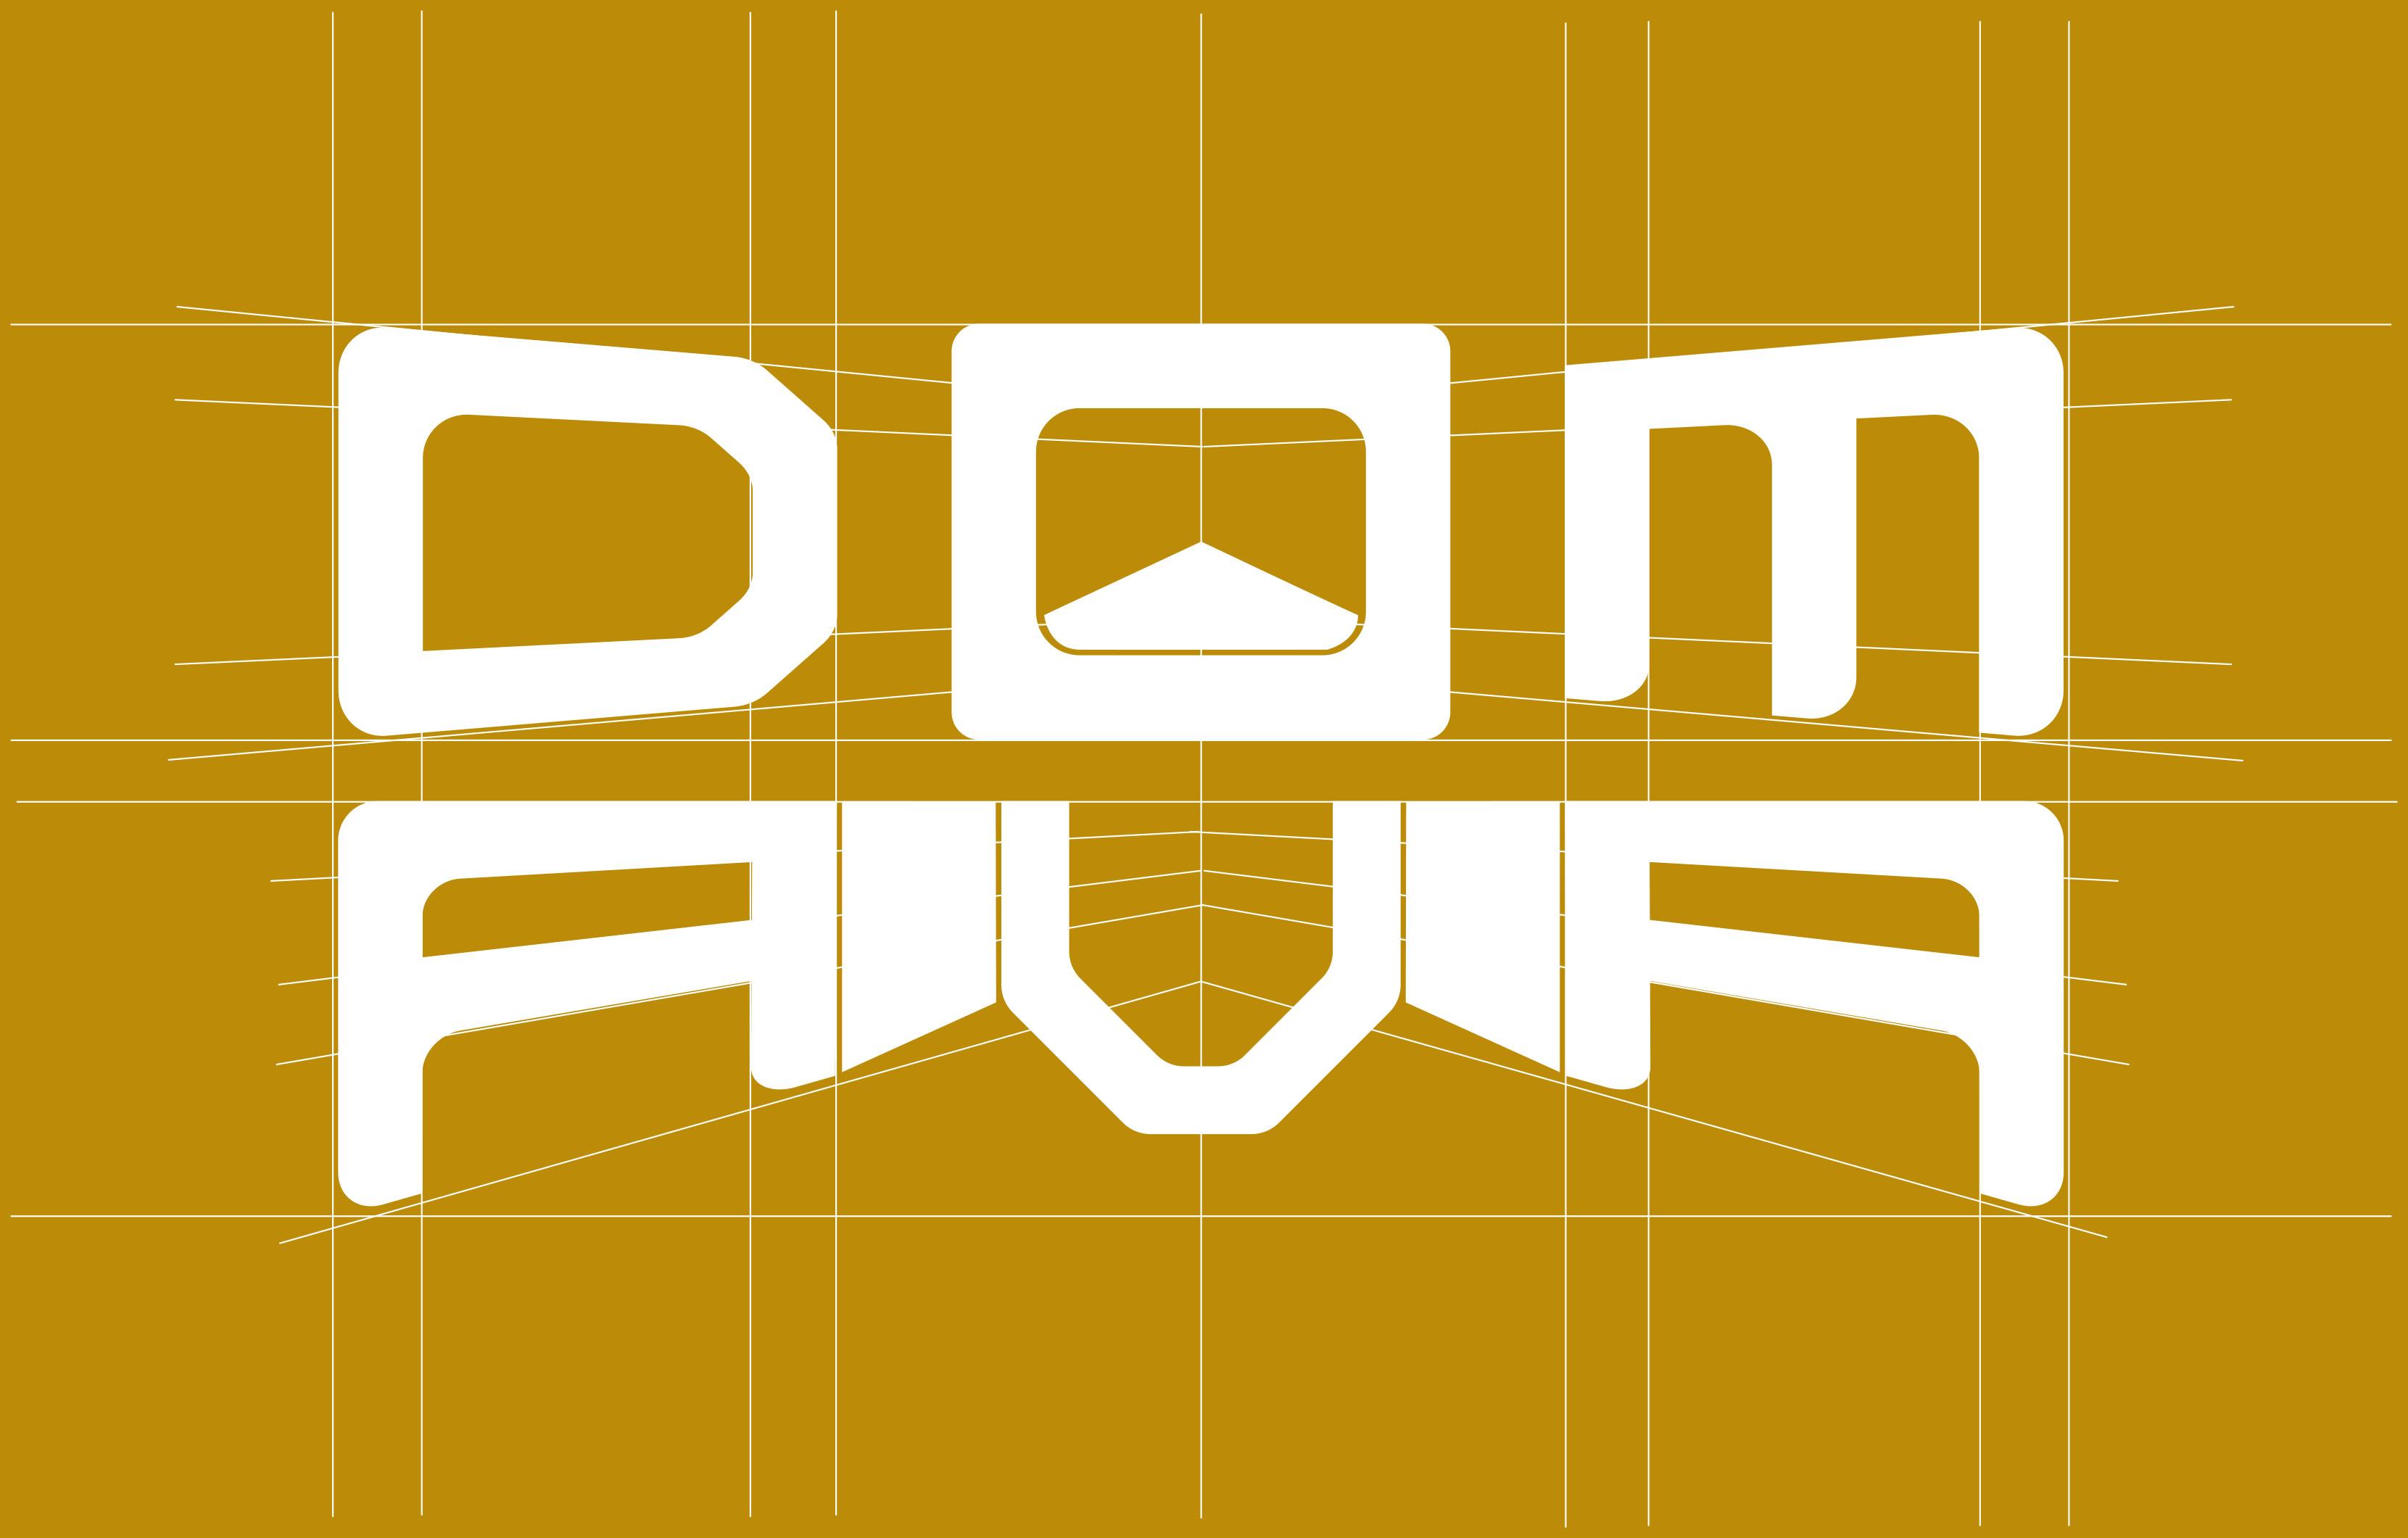 Разработка логотипа с паспортом стандартов фото f_2425b9d626bdaa21.jpg